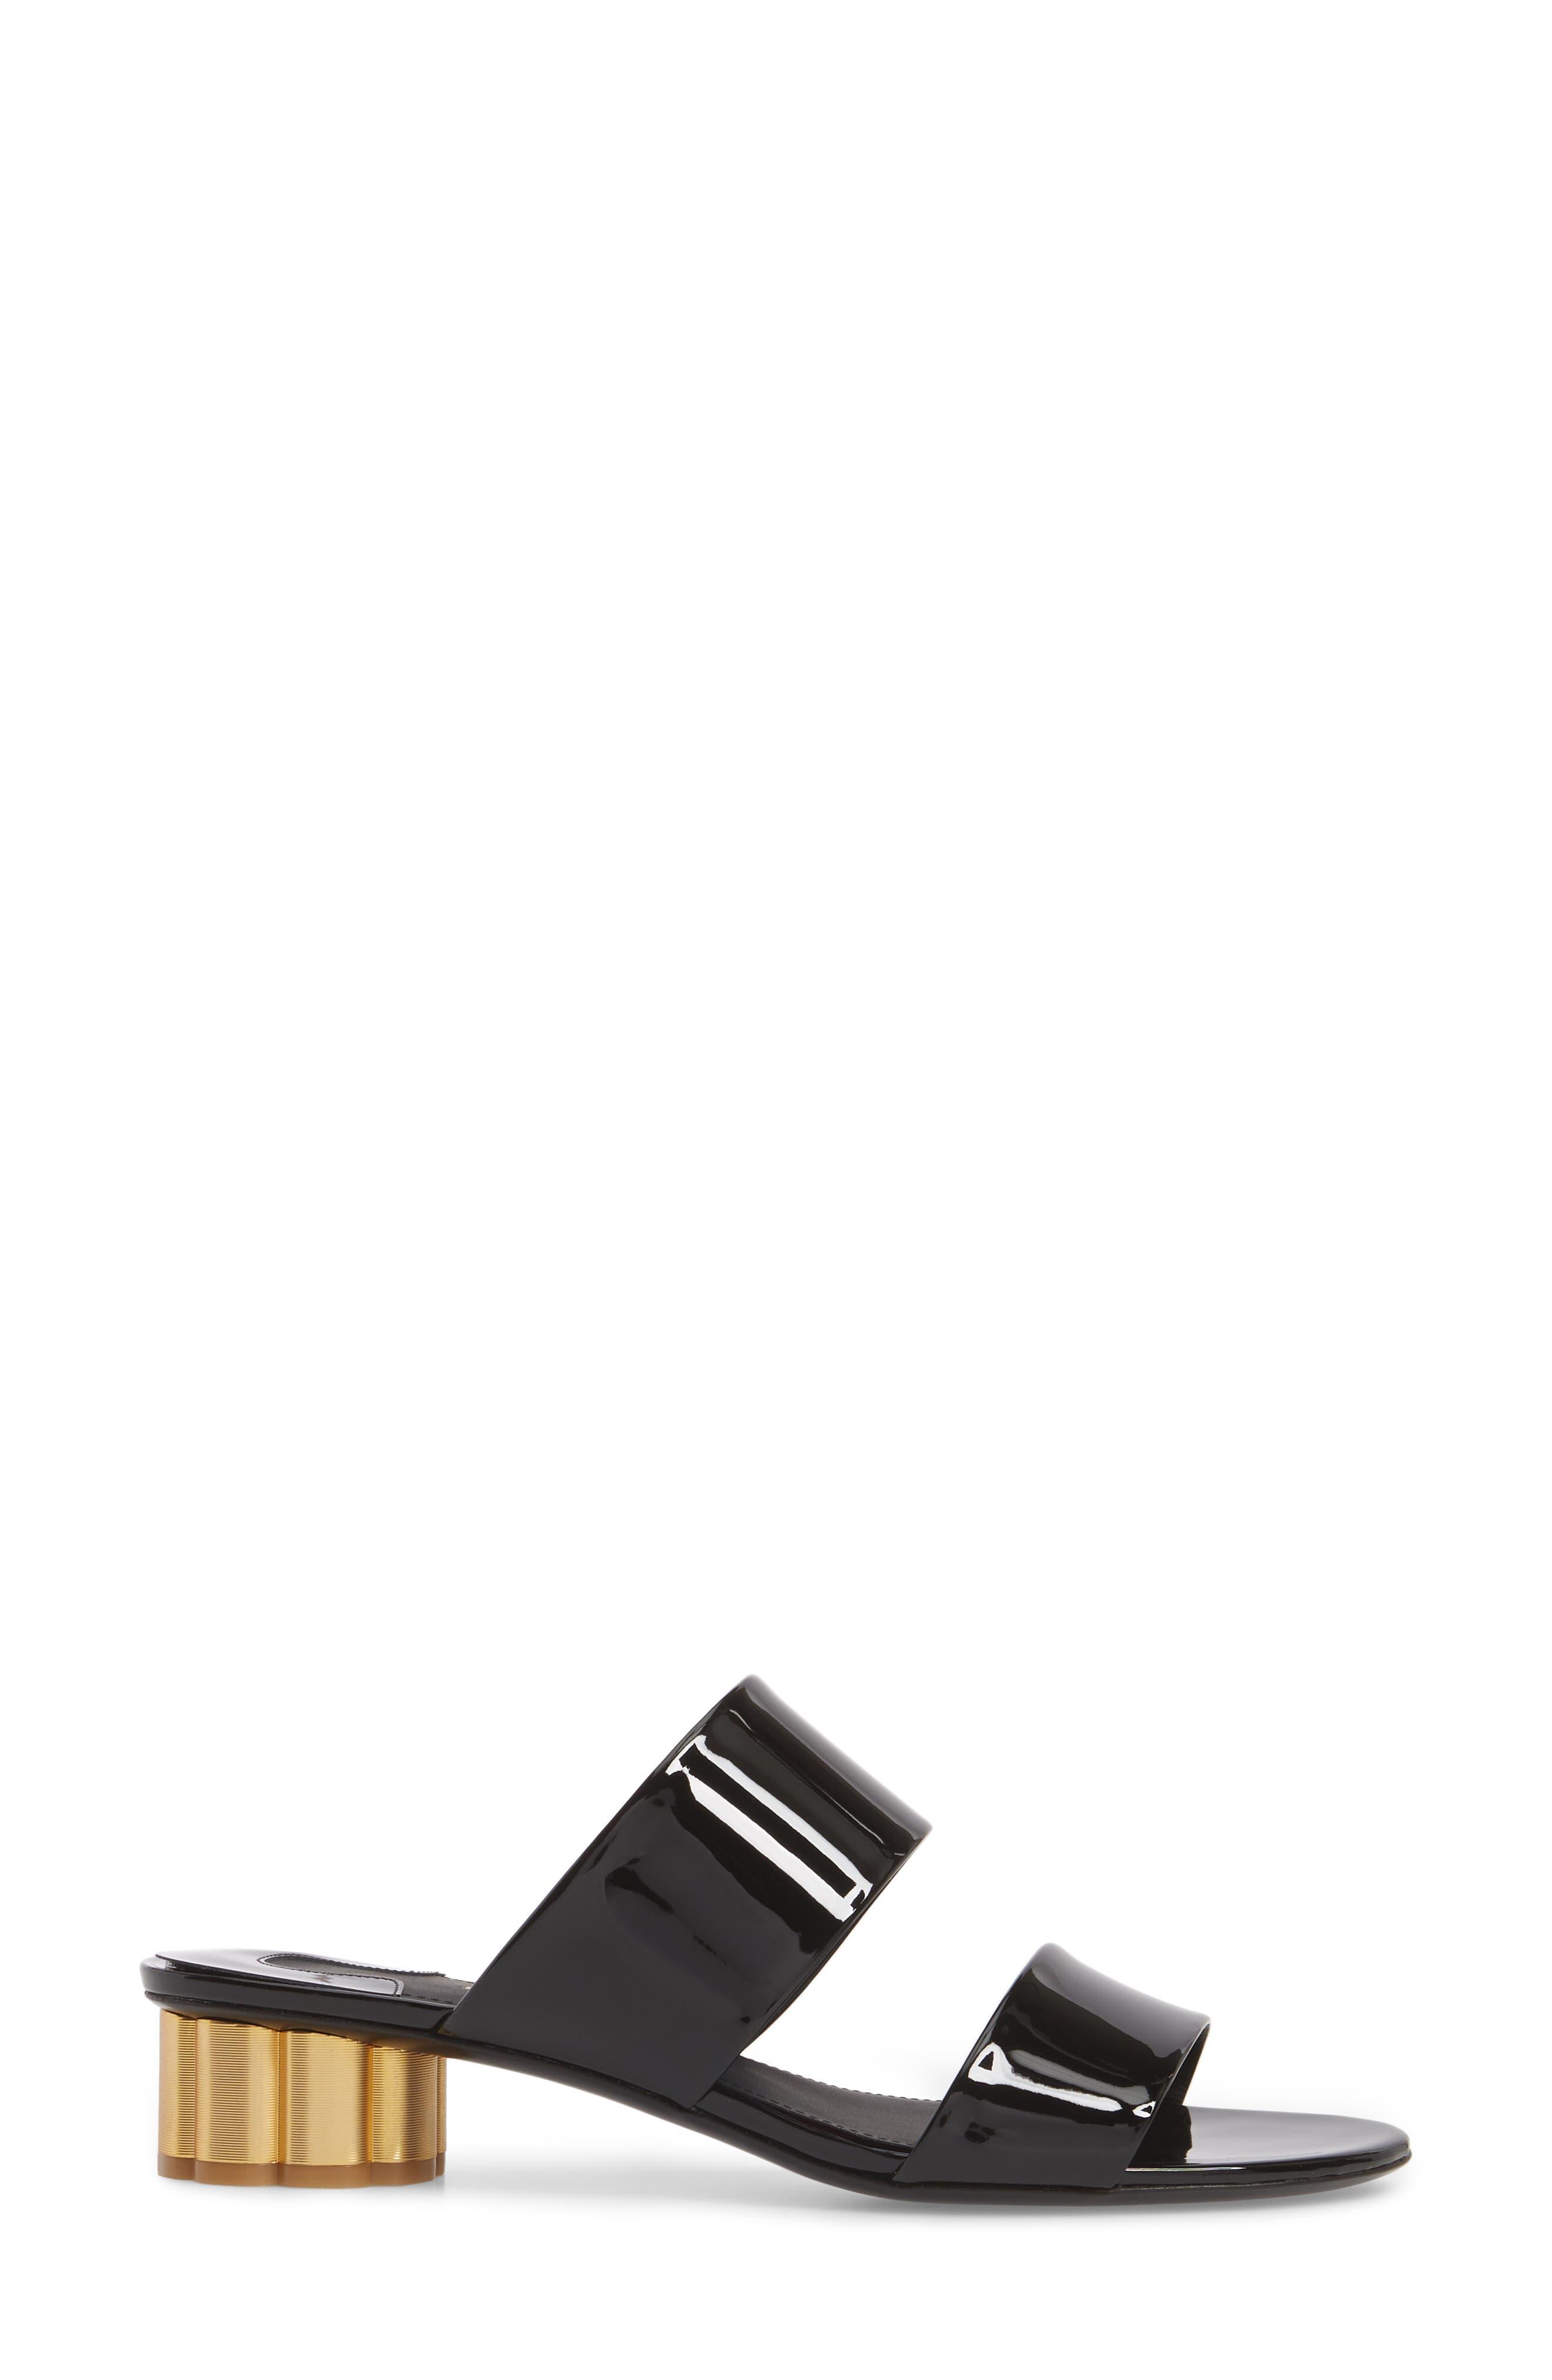 SALVATORE FERRAGAMO,                             Belluno Double Band Slide Sandal,                             Alternate thumbnail 3, color,                             BLACK PATENT LEATHER